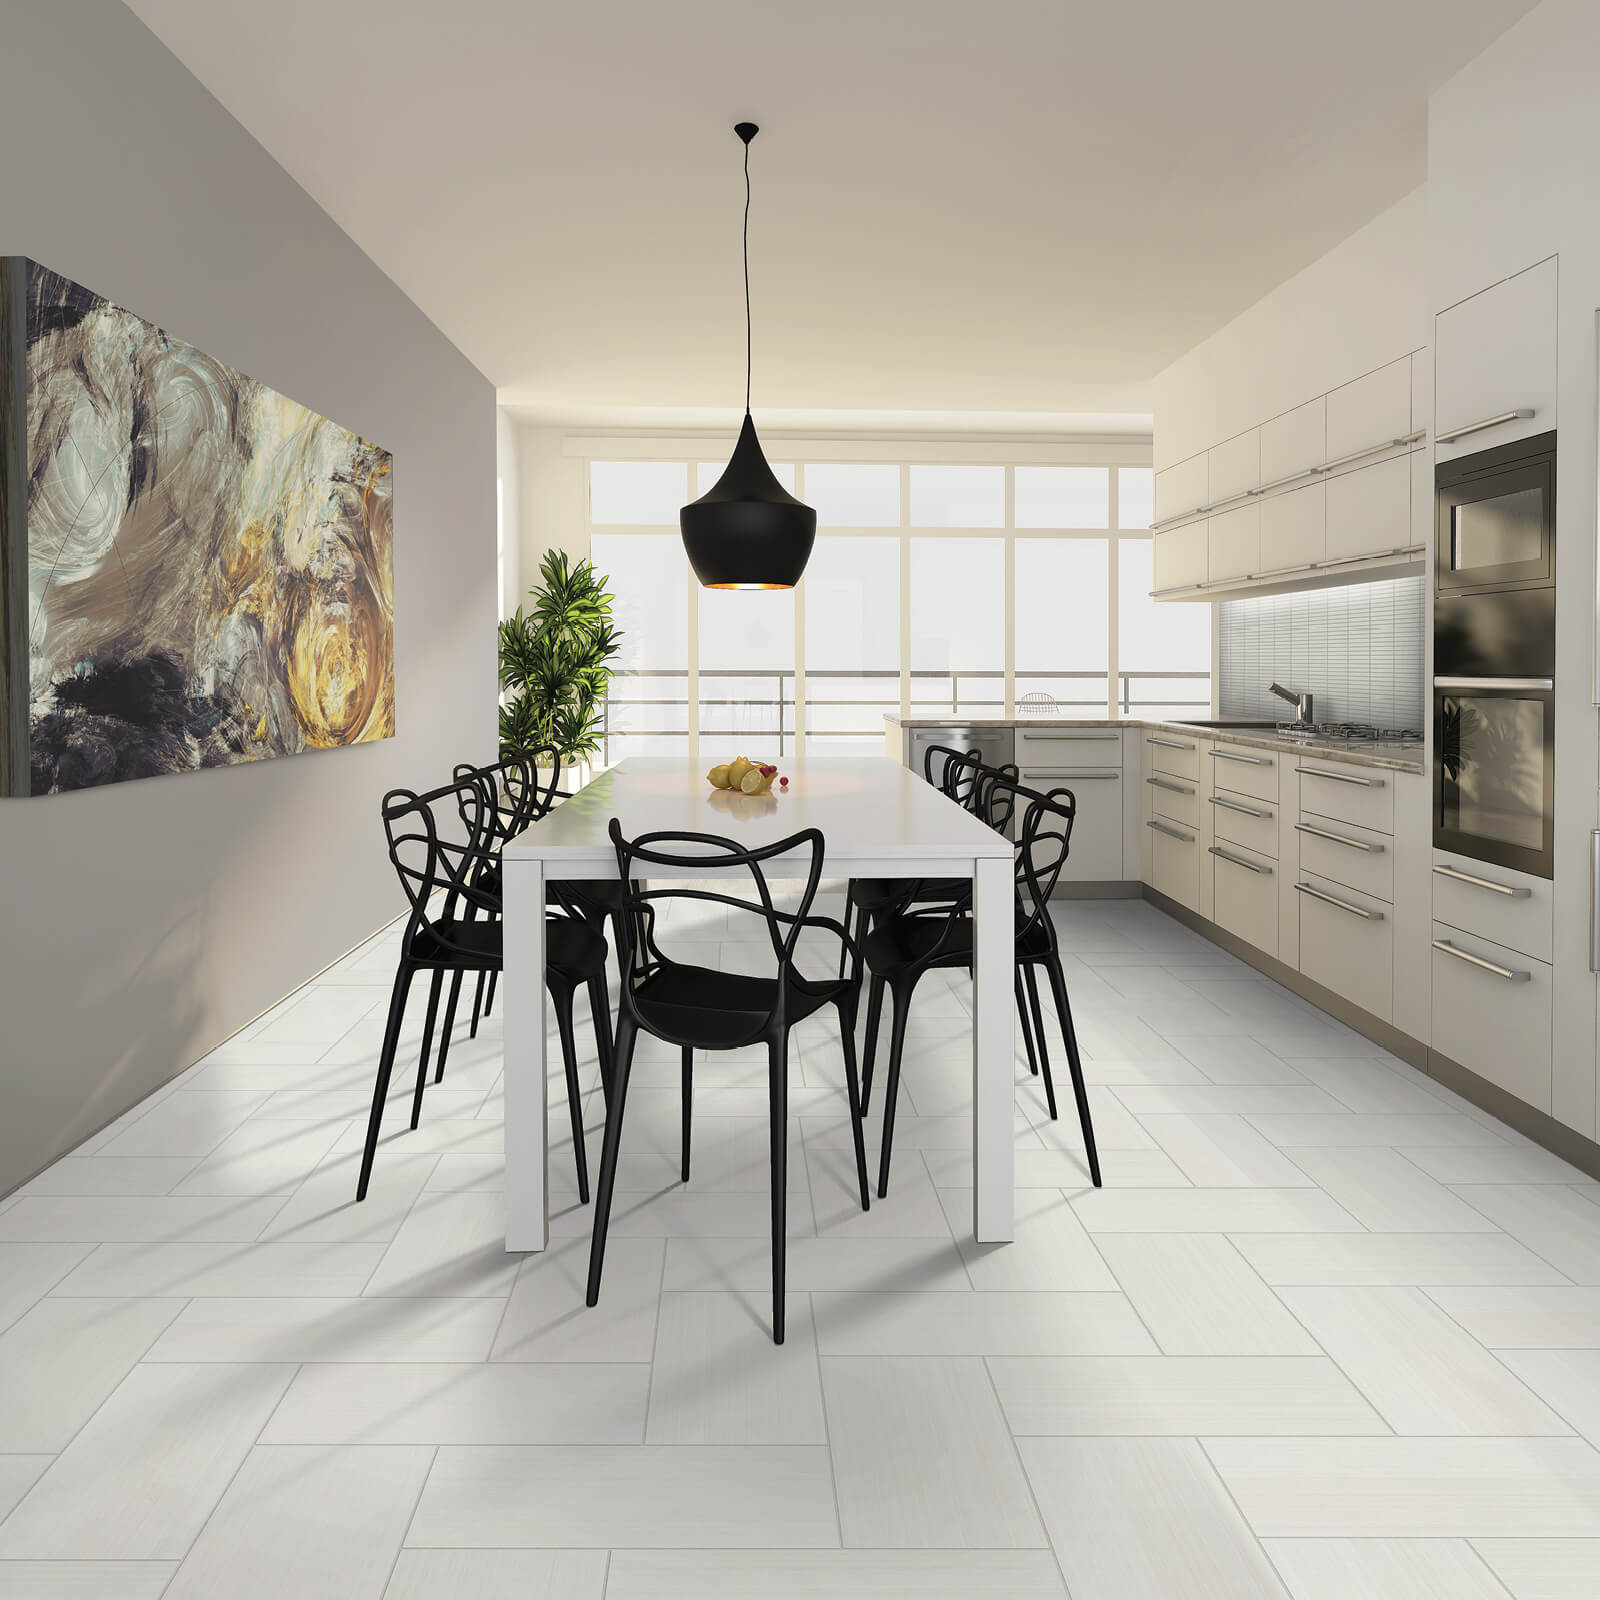 Dining room interior | Great Floors